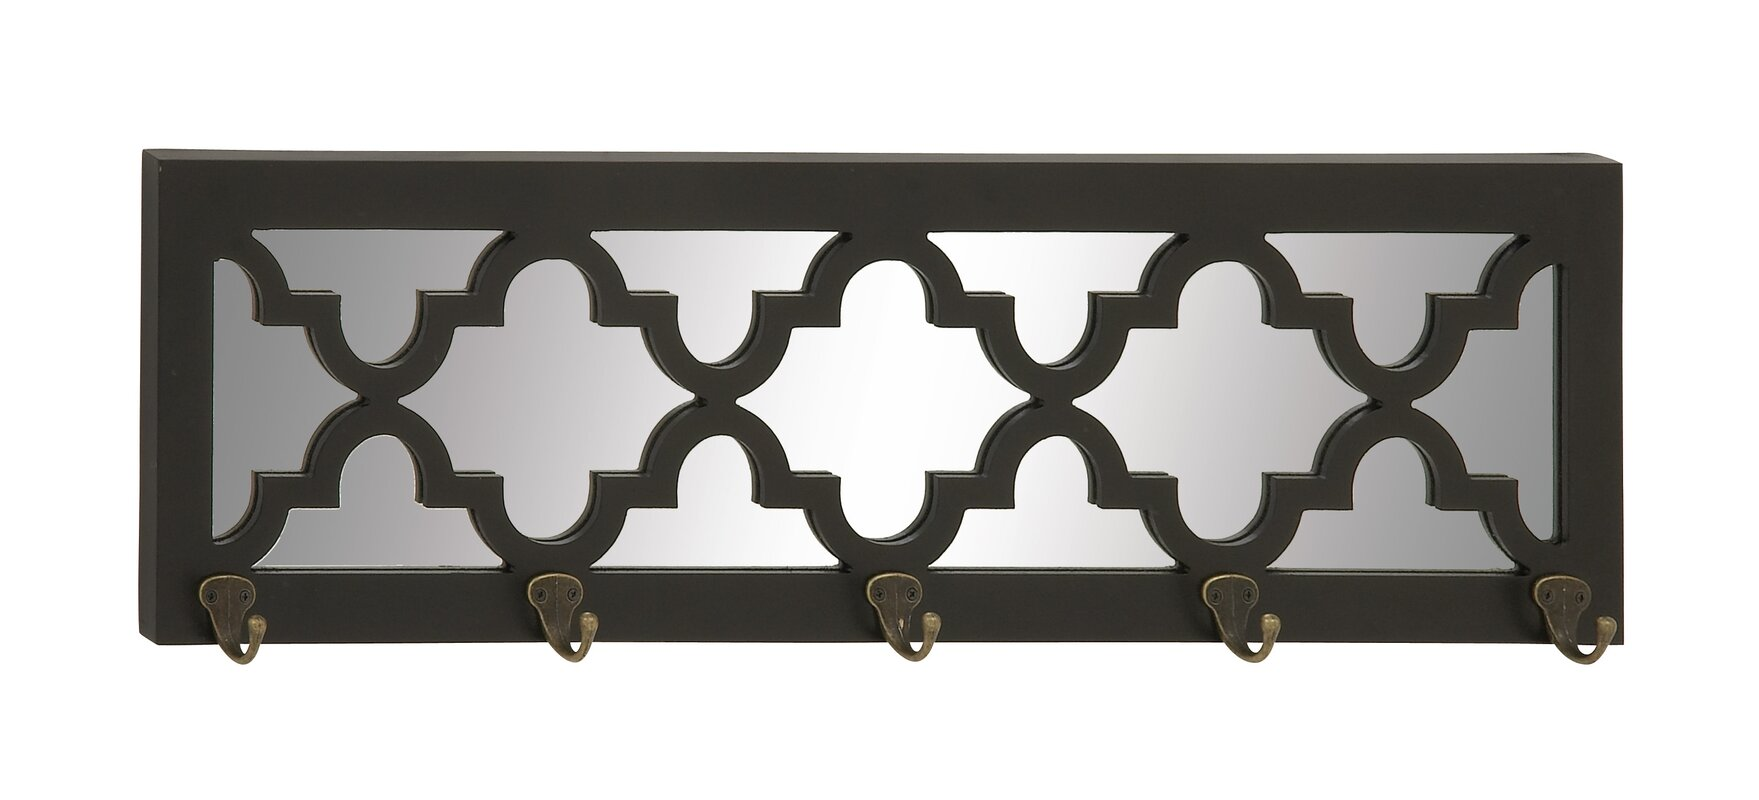 cole  grey wood mirror wall mounted coat rack  reviews  wayfair -  wall mounted coat racks  umbrella stands sku cogr defaultname